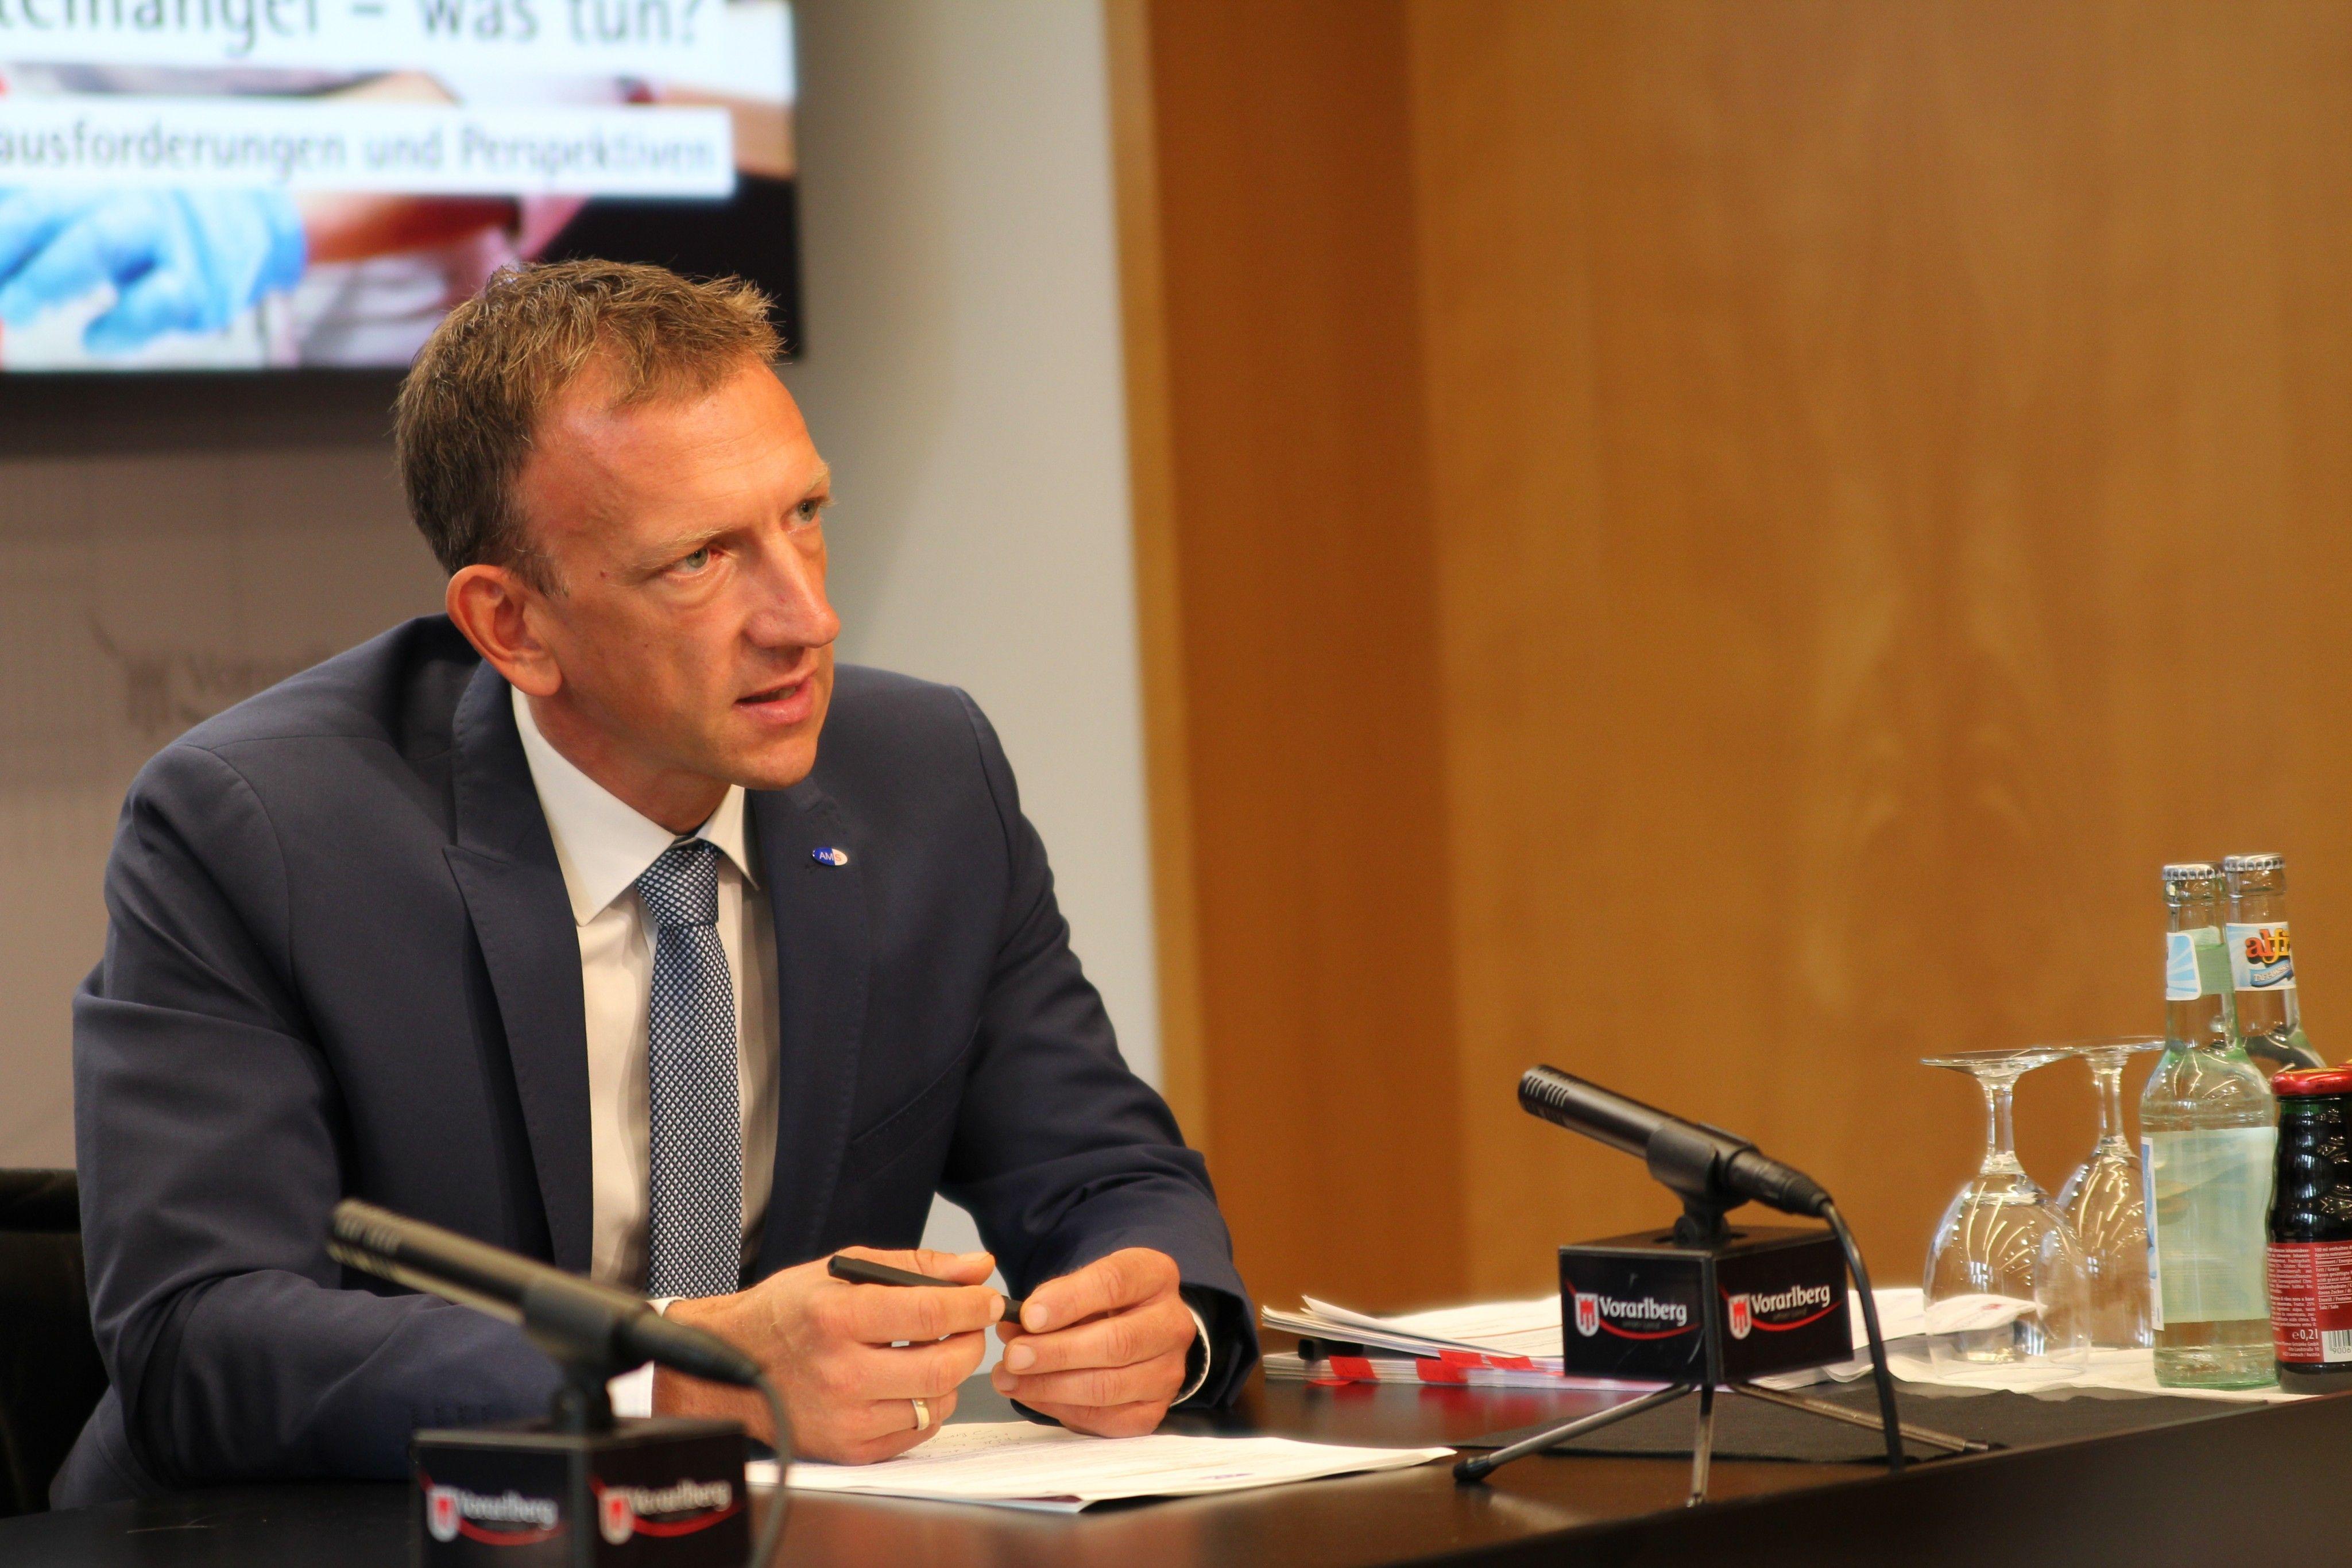 Vorarlberg: Fast doppelt so viele Arbeitslosengeldsperren